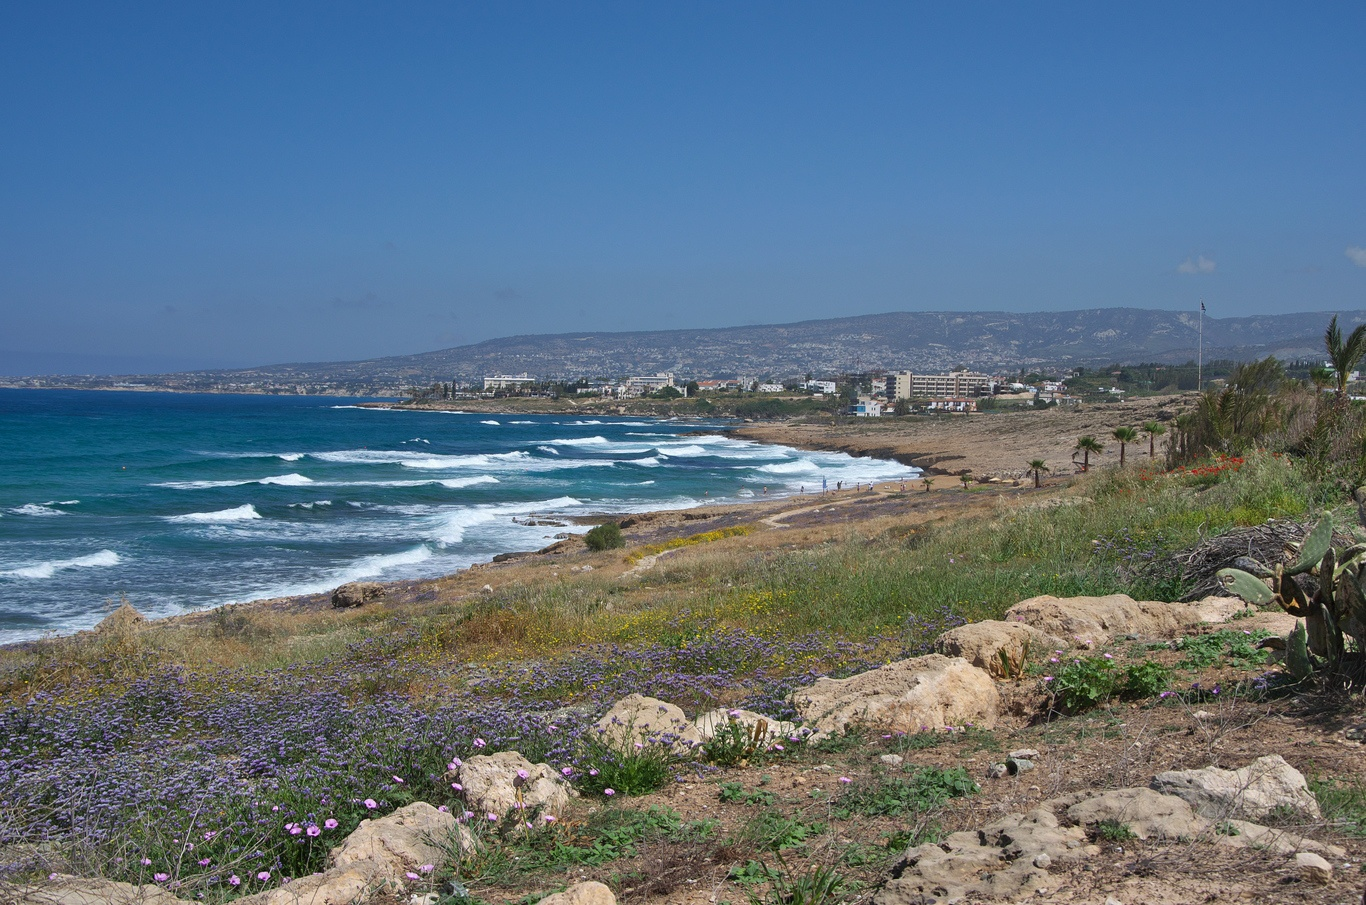 Pobřeží u Paphosu